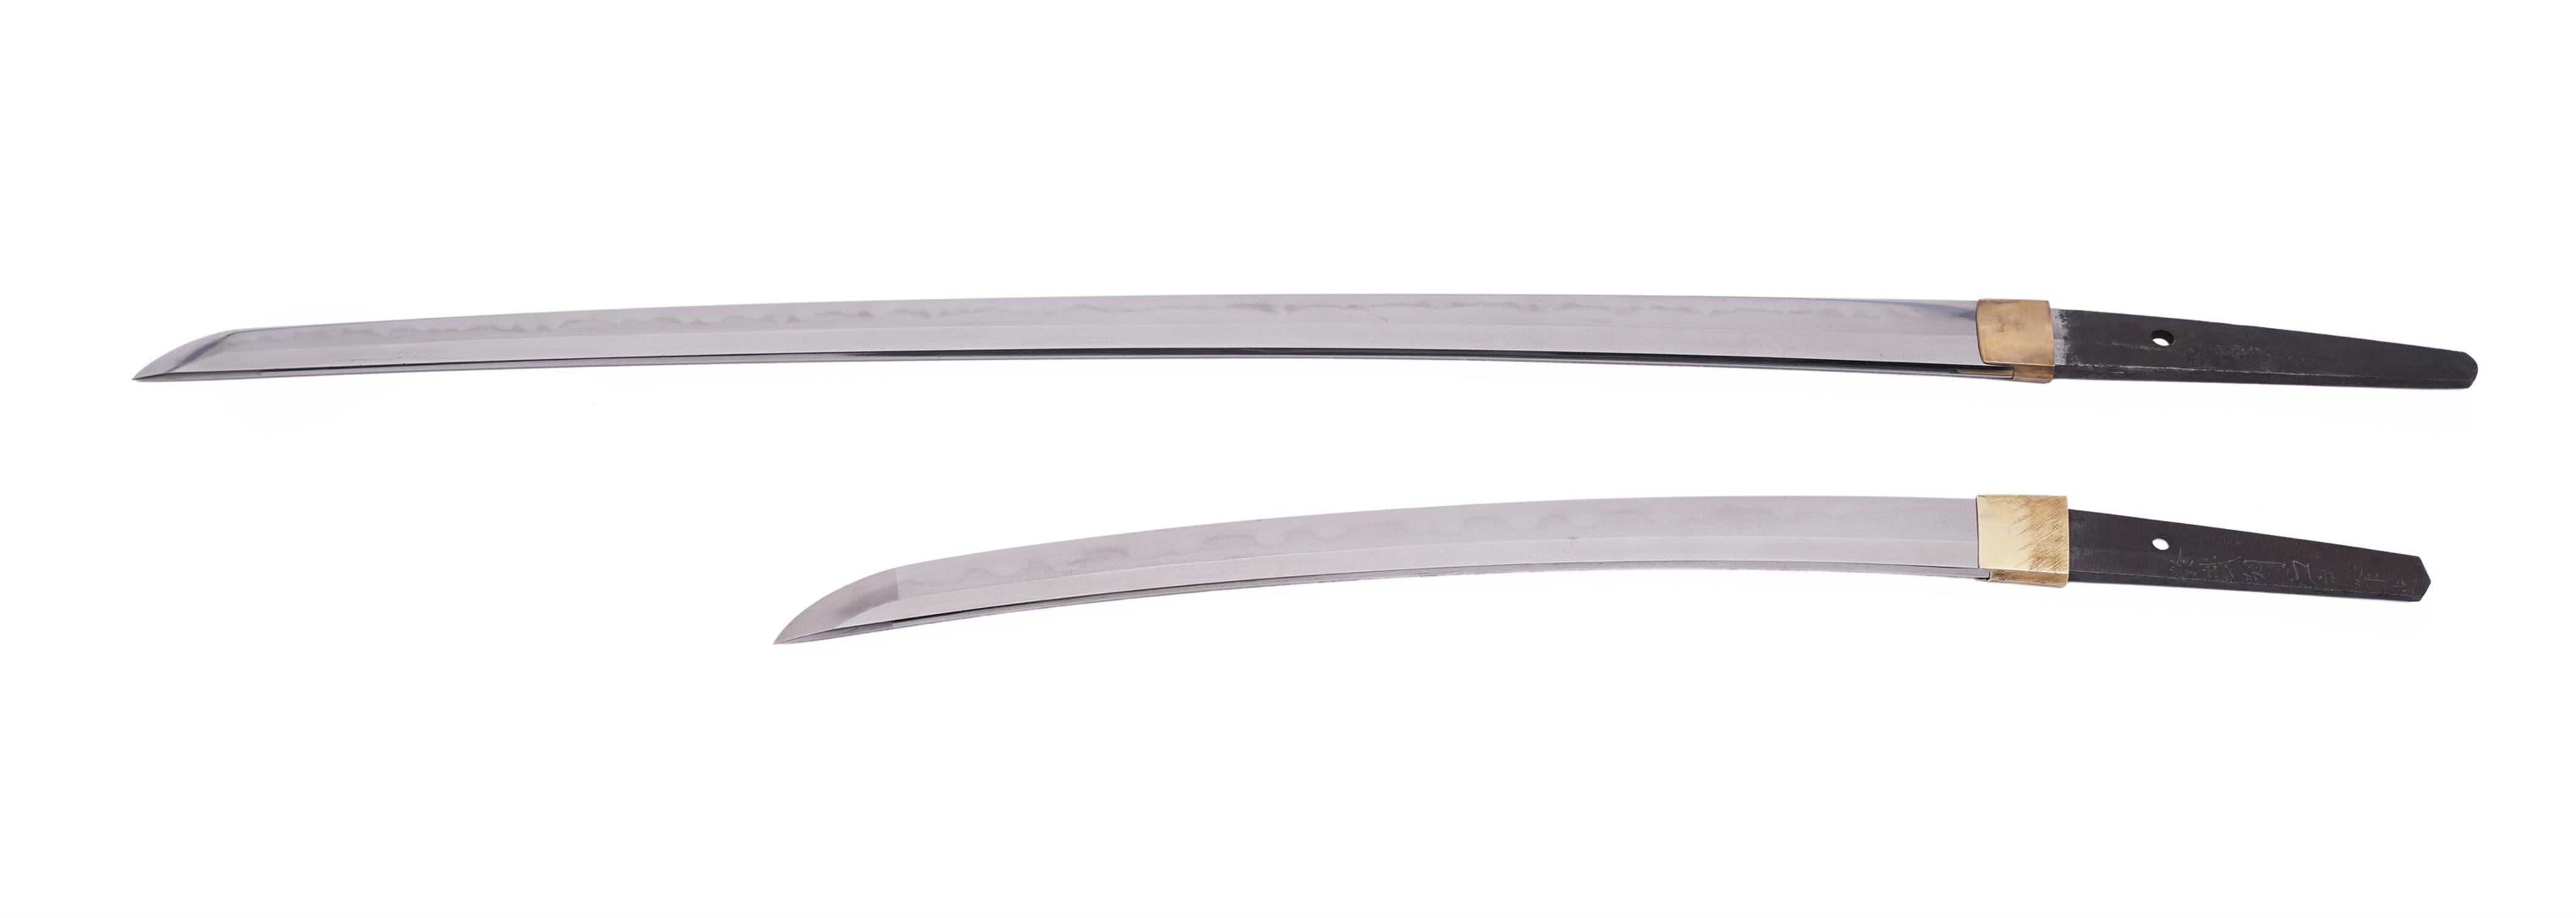 .A PAIR OF SAMURAI SWORDS, DAISHO Japan 1. Description of the katana: The katana is Shinto according - Image 9 of 24